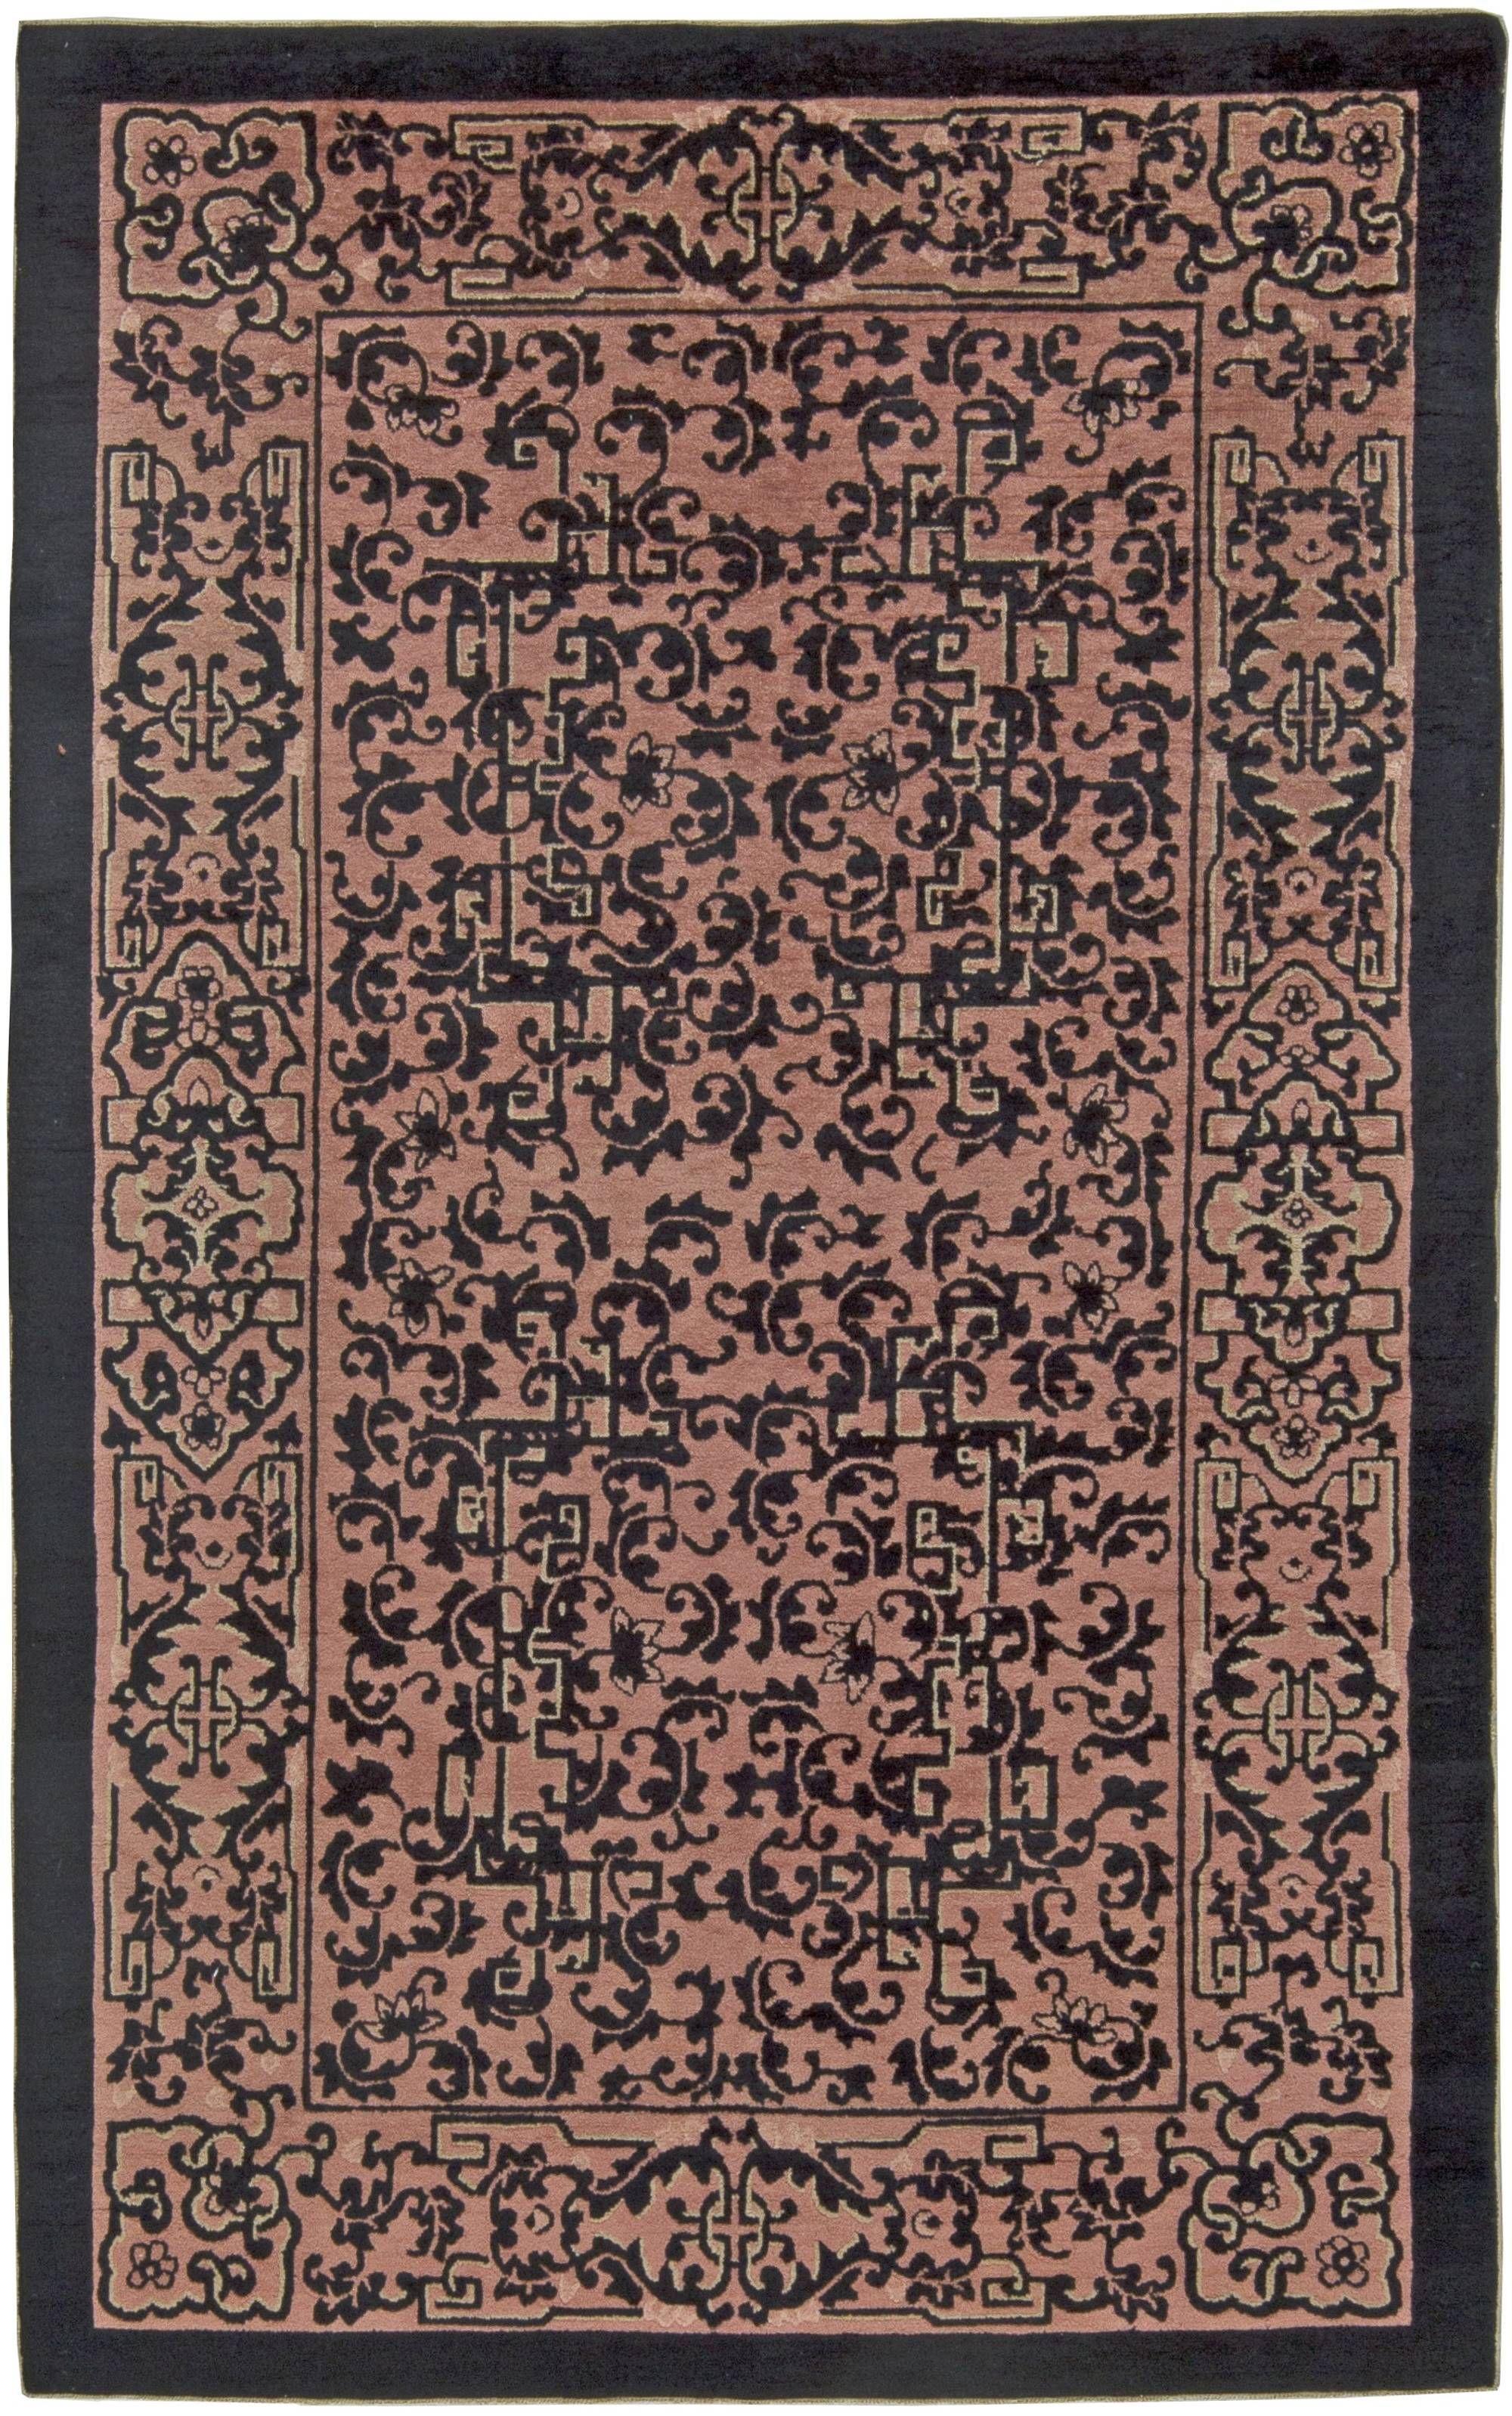 Vintage Rugs Vintage Rug (Chinese) For Modern Or Oriental Interior